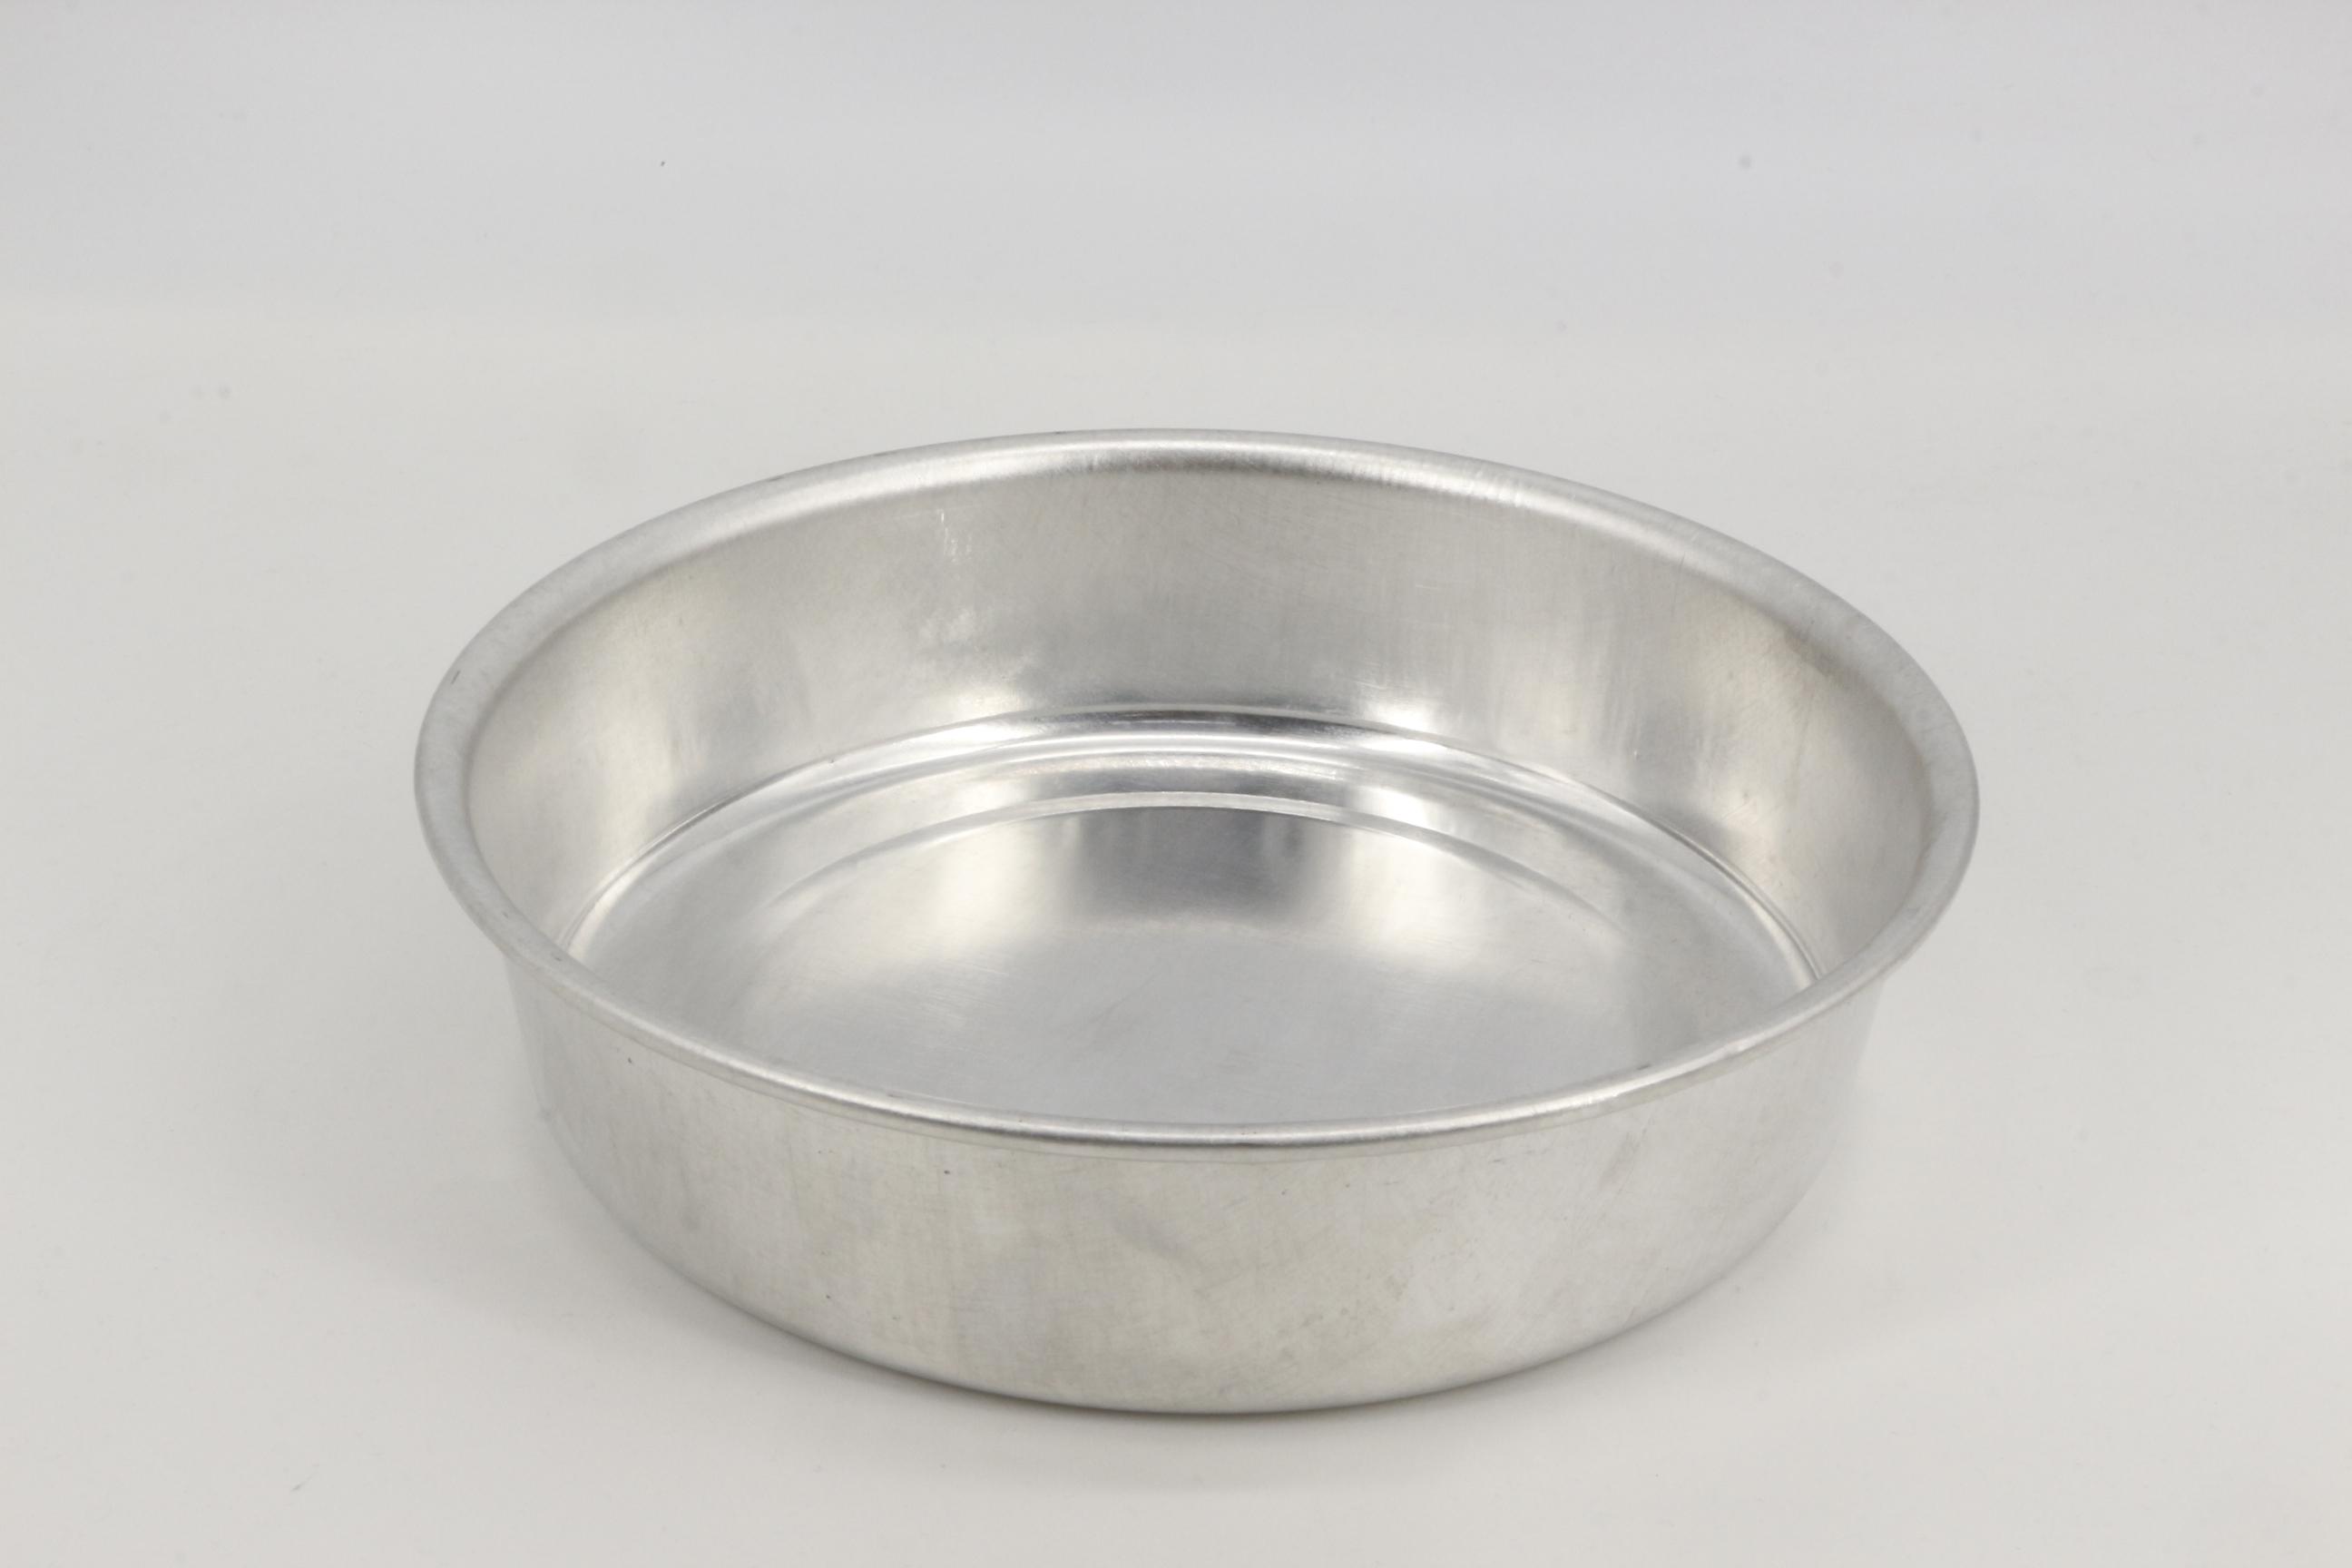 20cm Aluminium Deep Round Cake Tin / Acuan Cake